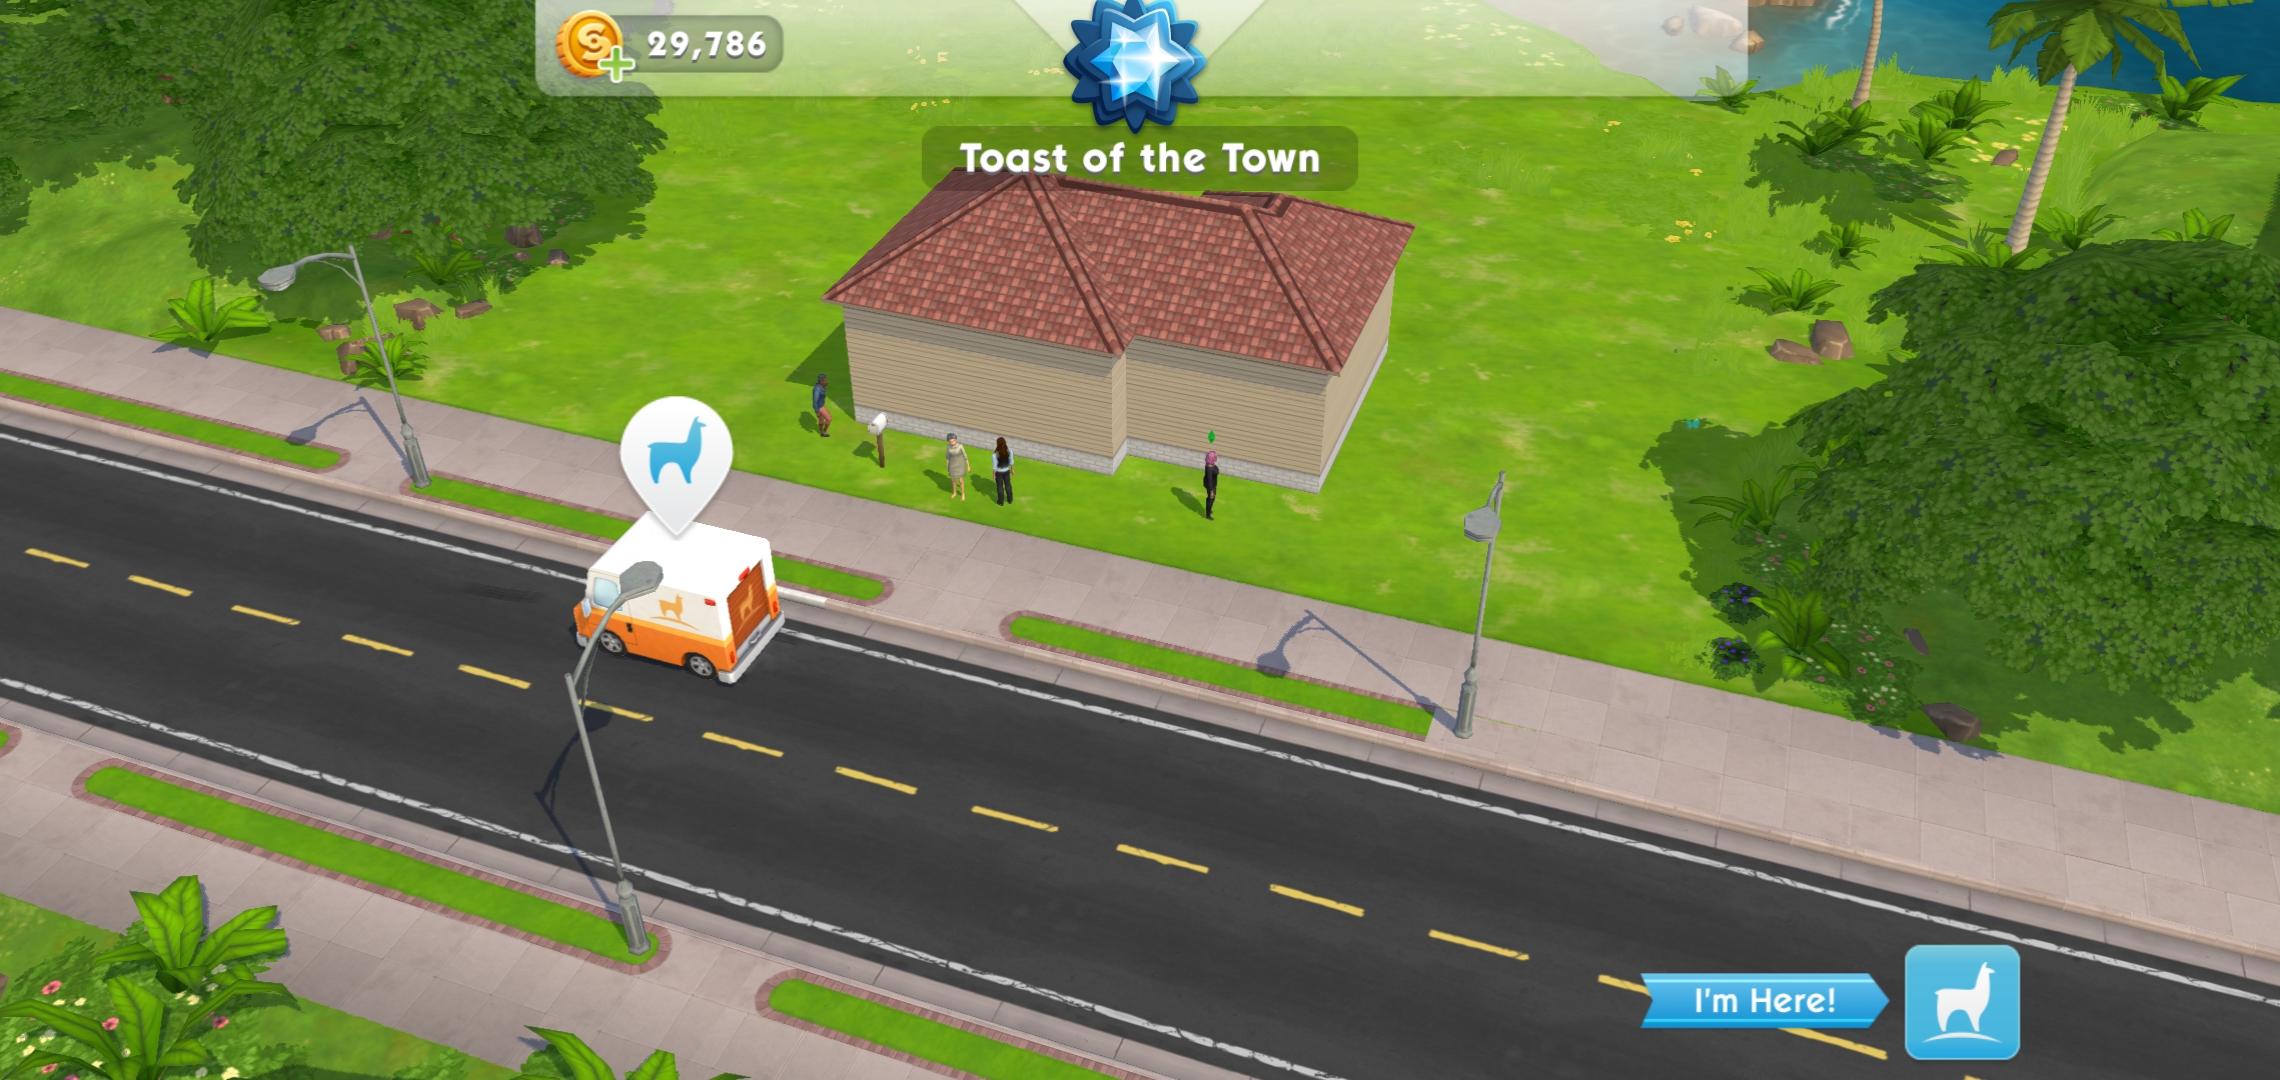 Screenshot_20201028-131348_The Sims.jpg